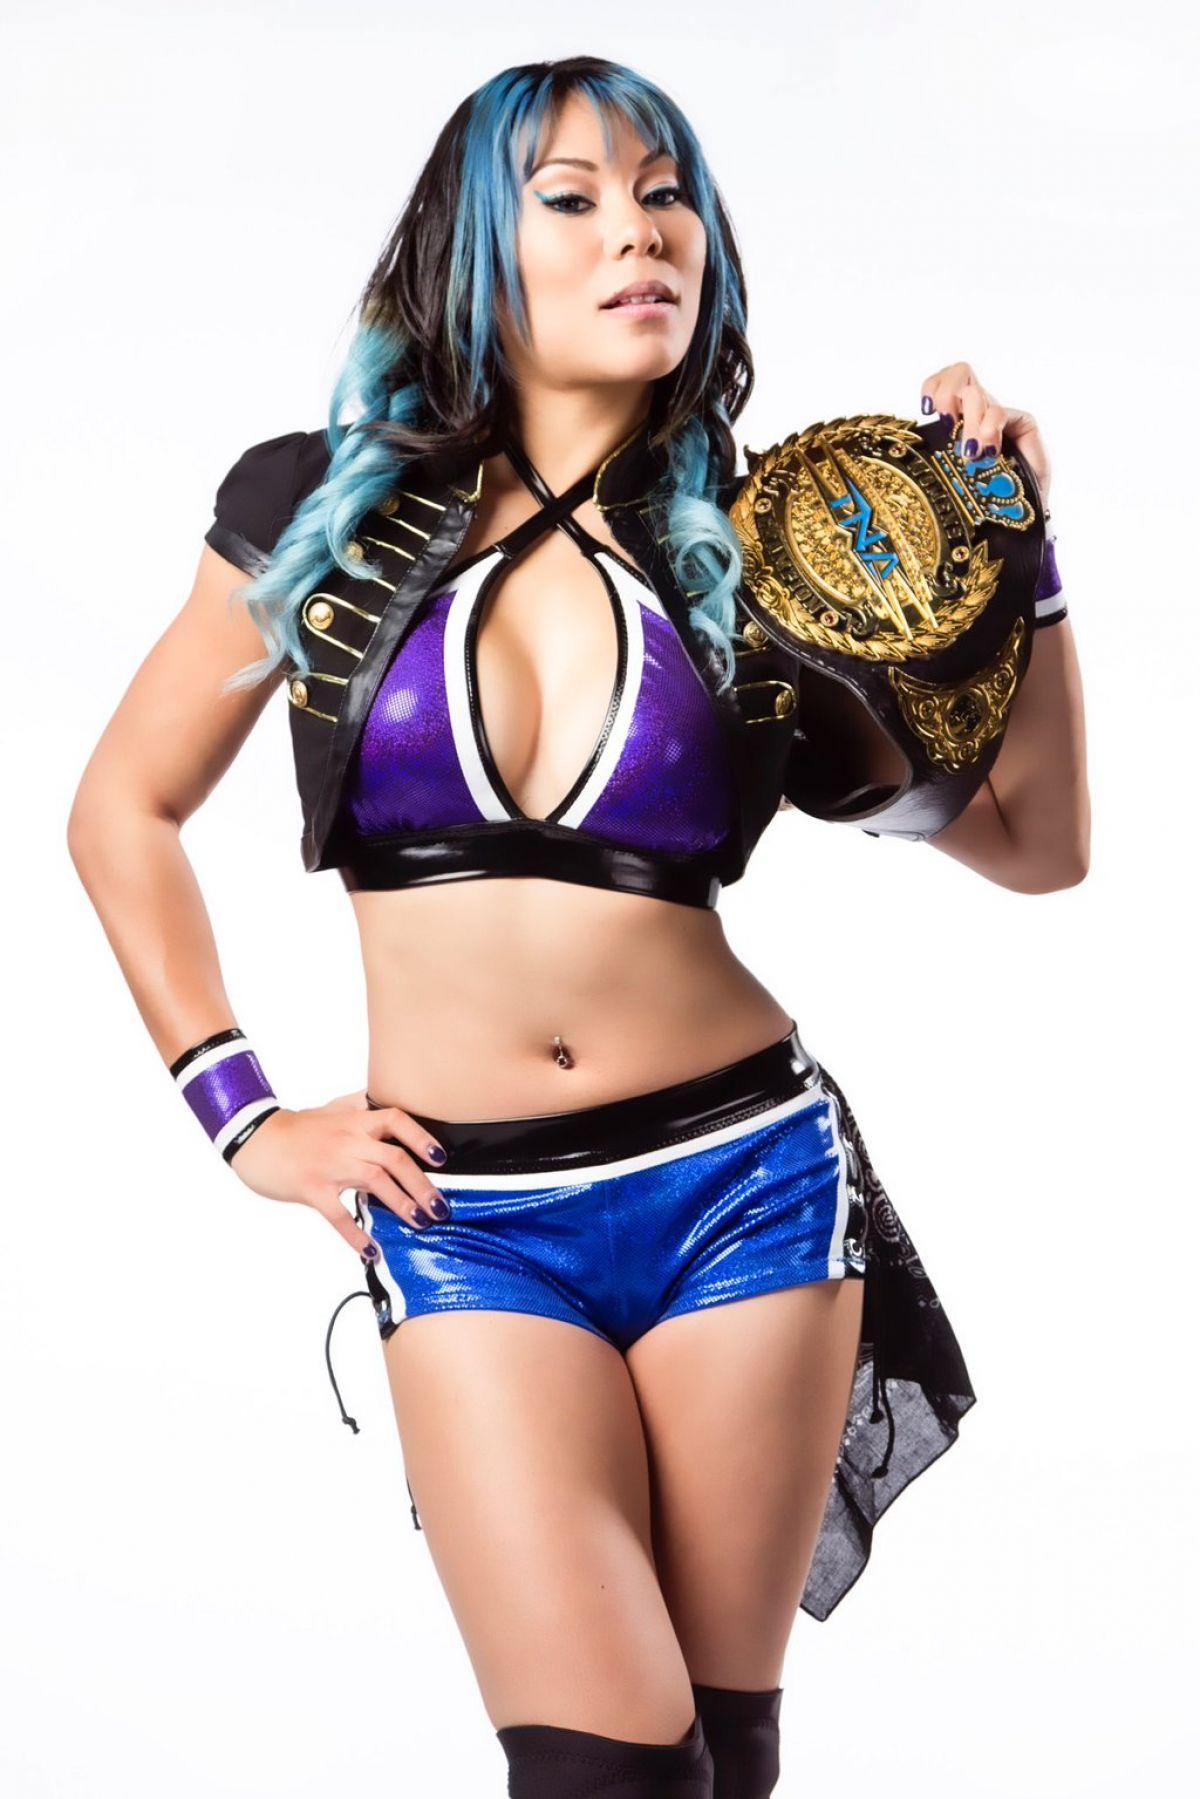 WWE - Jade Knockouts Champion Photoshoot